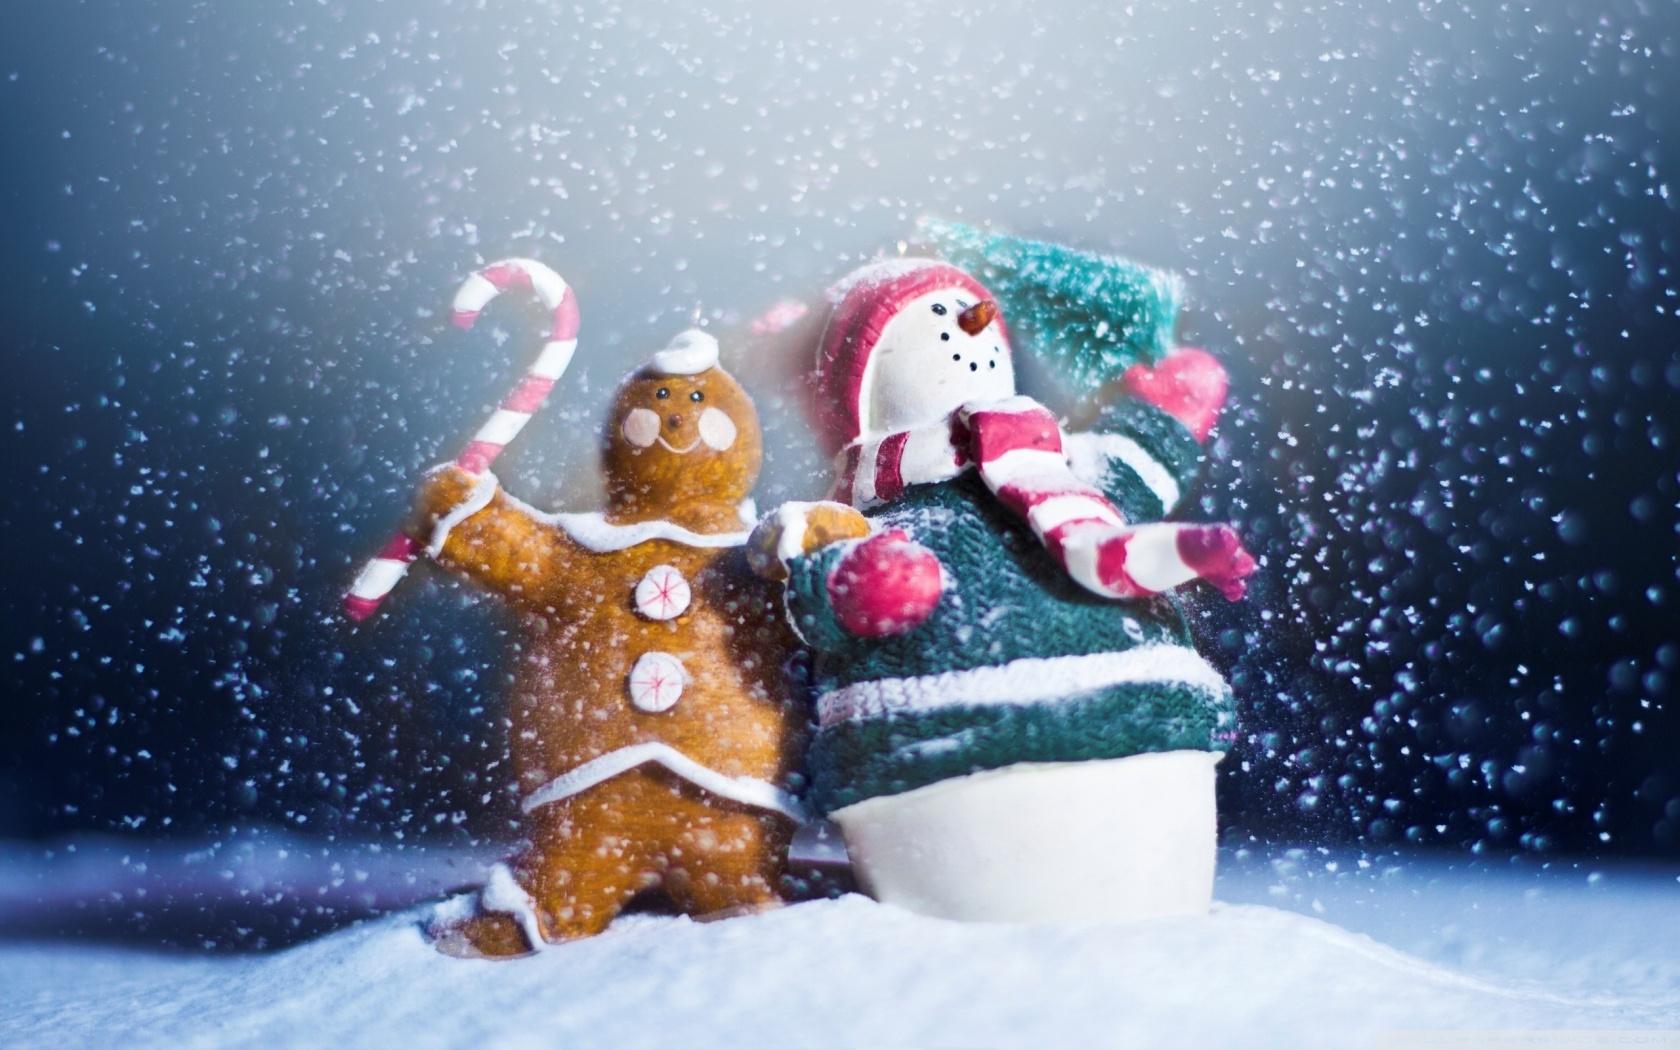 merry christmas wallpapers new year - HD Desktop ...